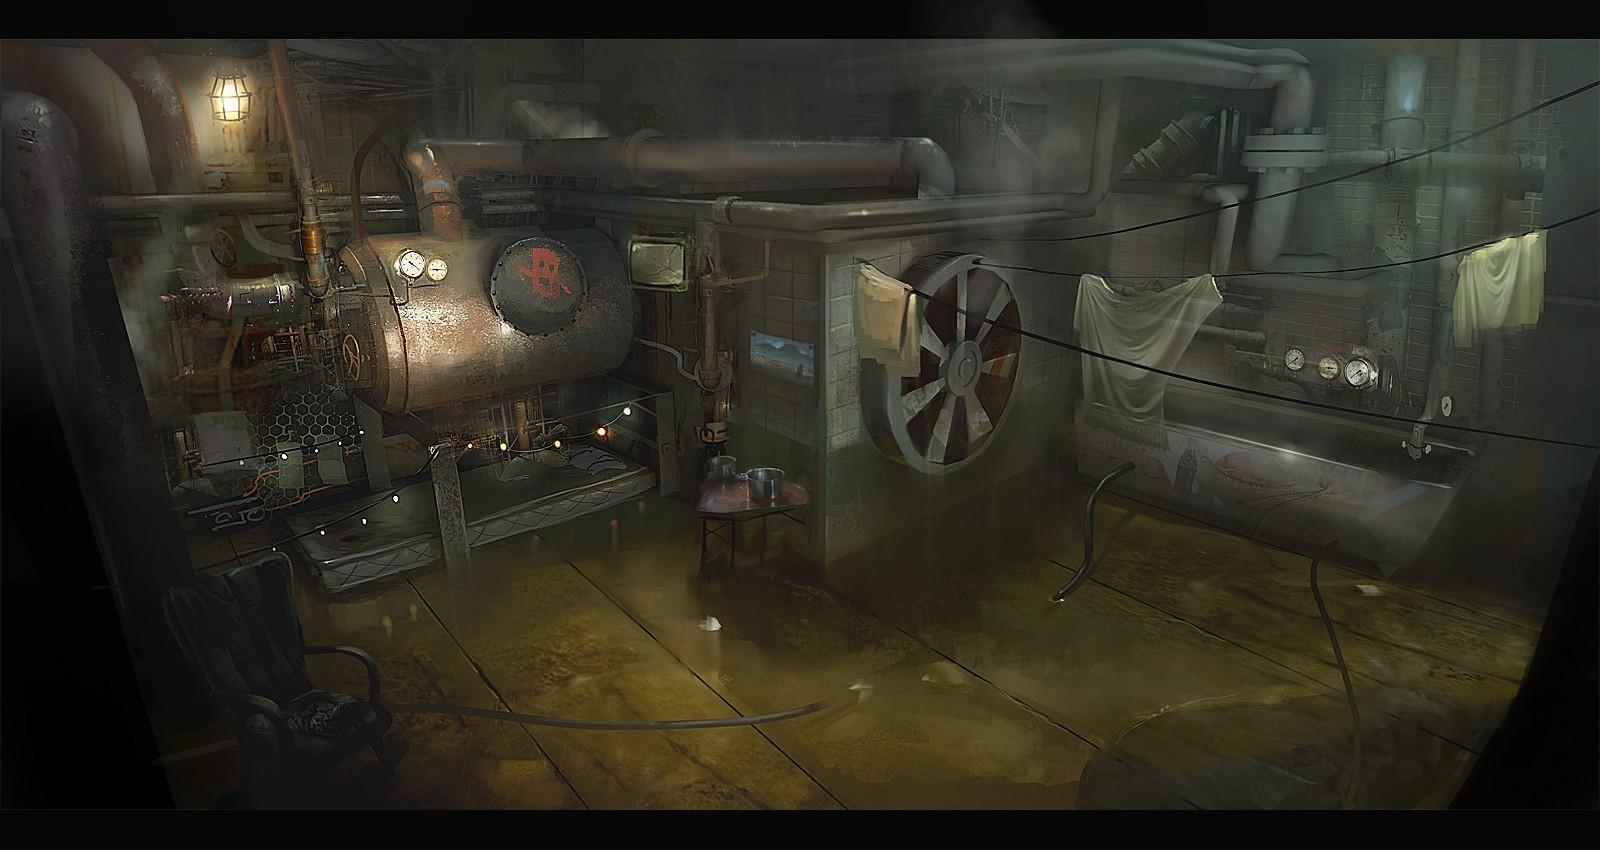 boilerroom | Explore boilerroom on DeviantArt